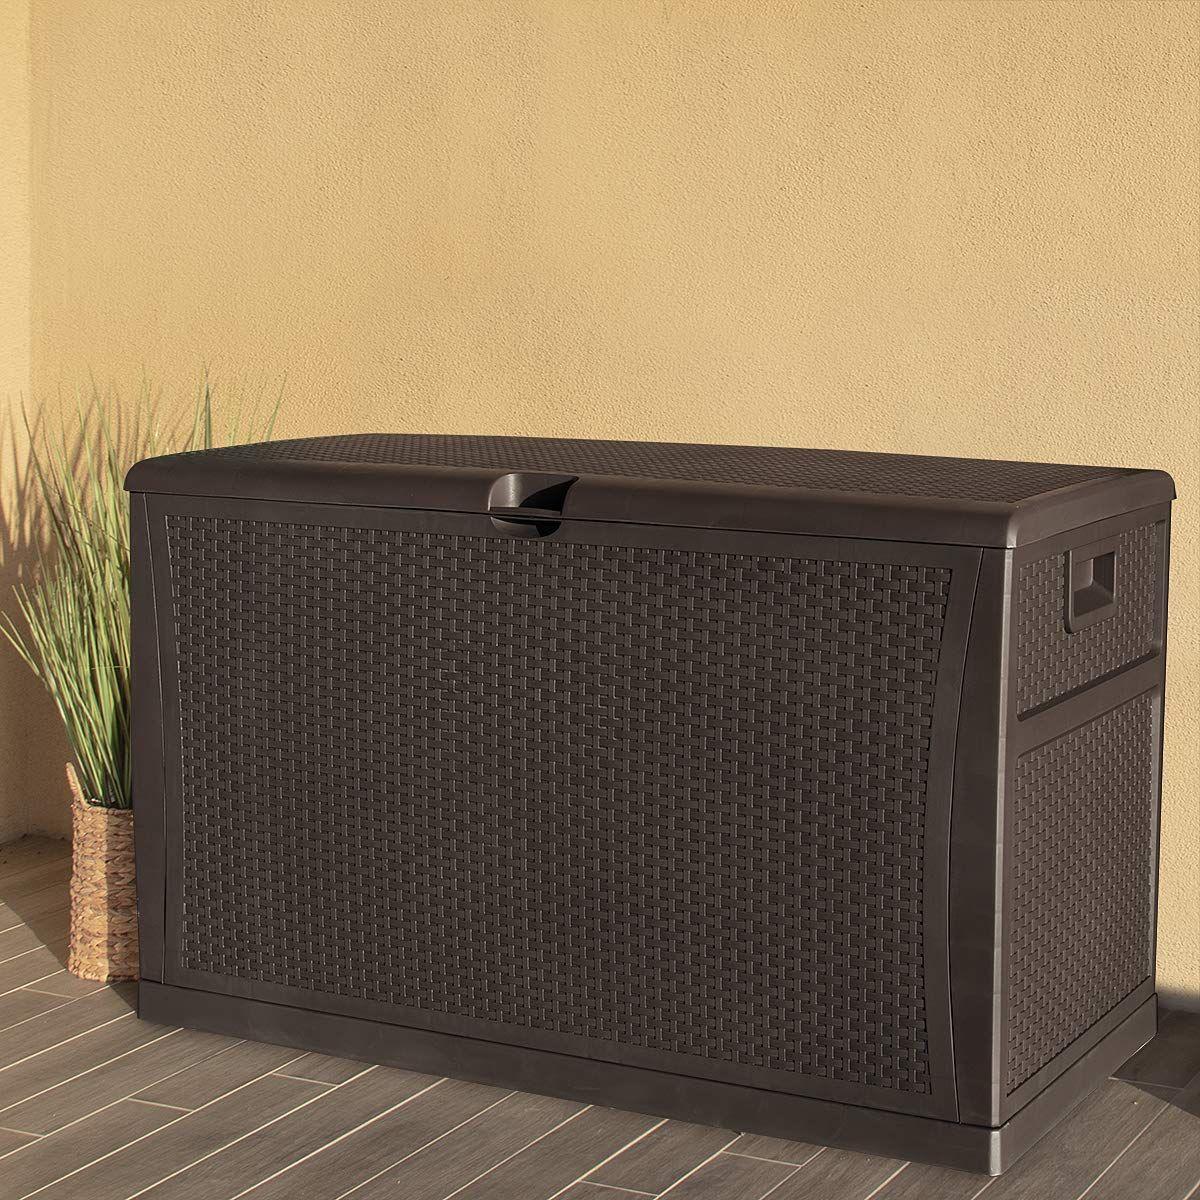 brown large outdoor deck storage box